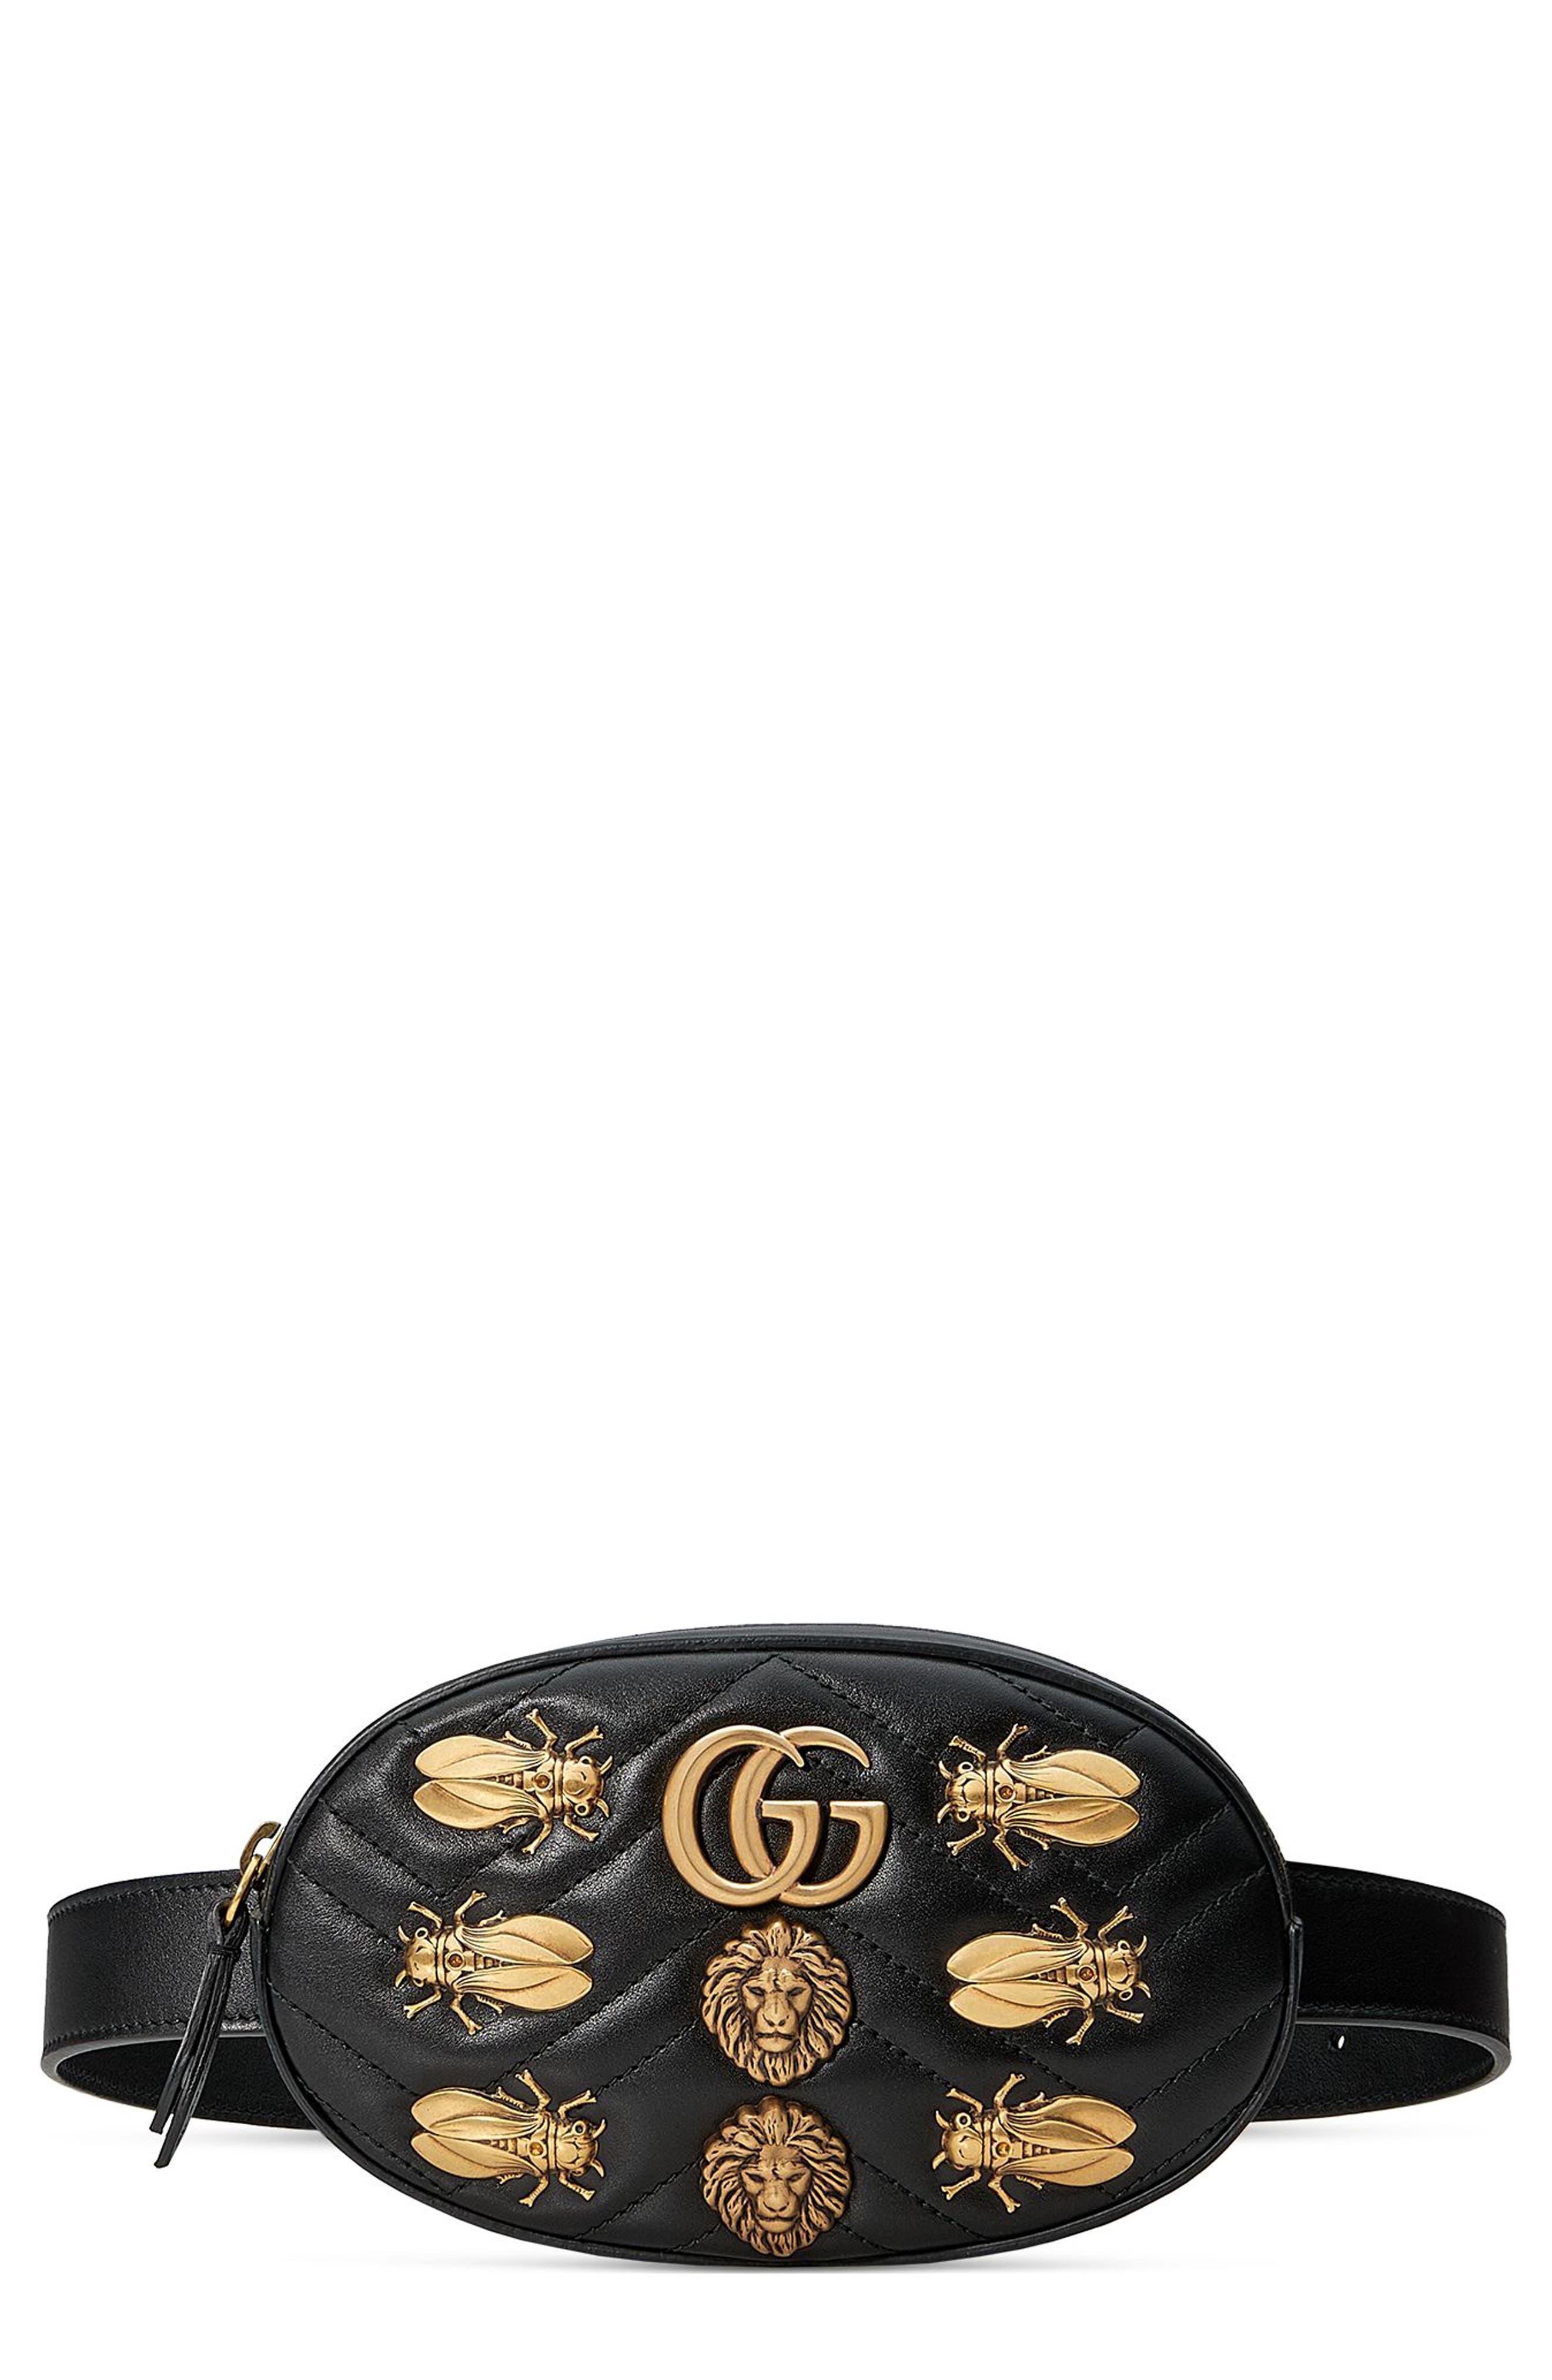 GG Marmont 2.0 Animal Stud Matelassé Leather Belt Bag,                             Main thumbnail 1, color,                             001